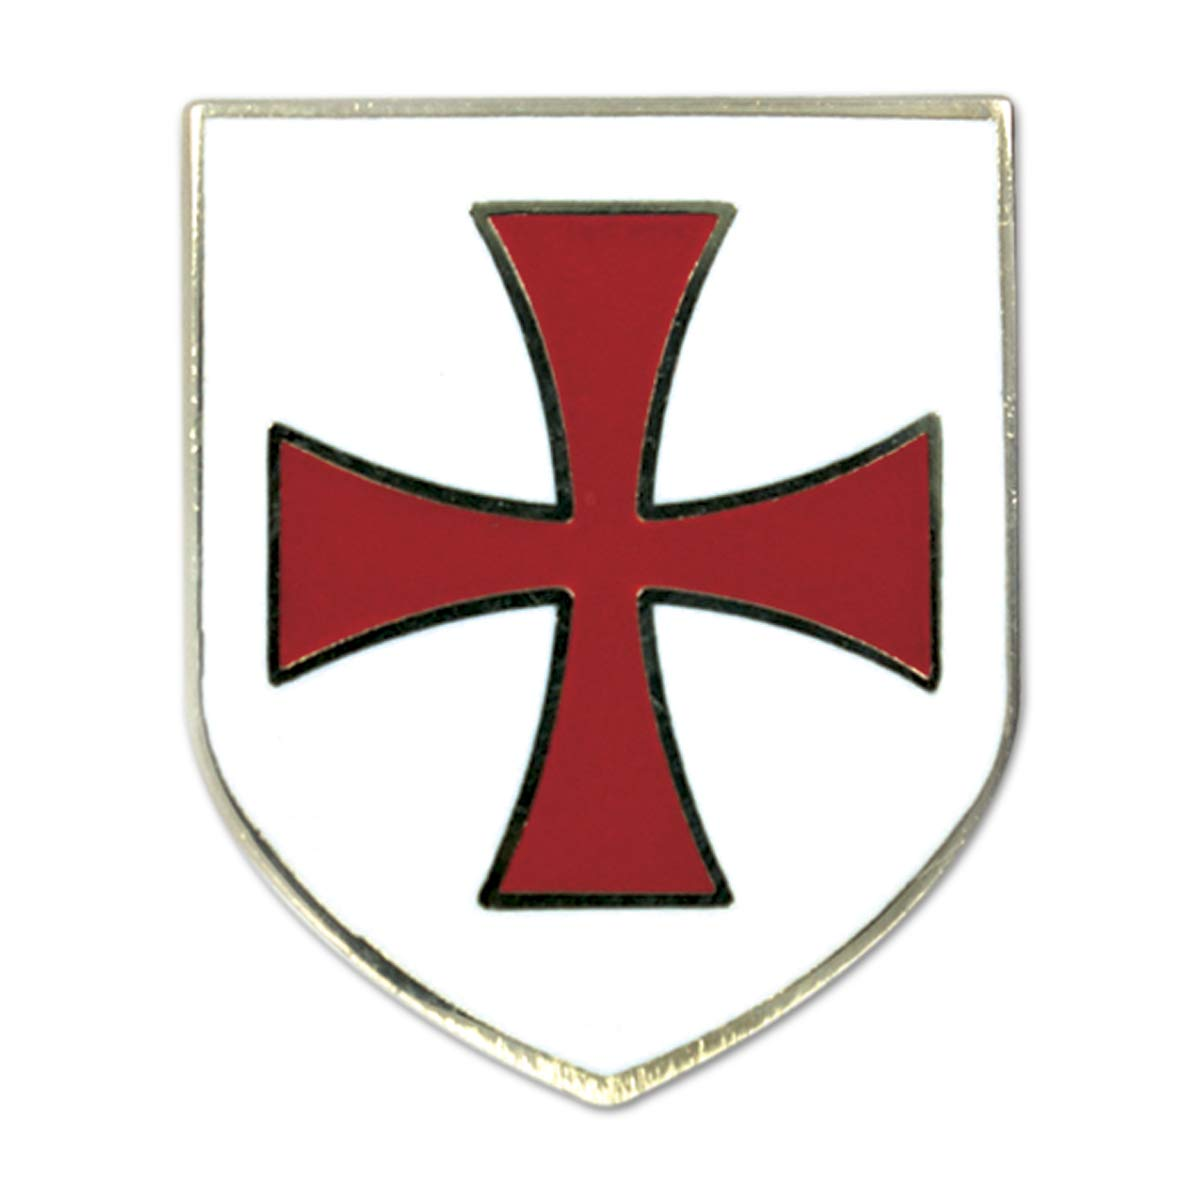 Knights Templar Crusader Red Cross White Shield Freemasonic Lapel Pin - 1